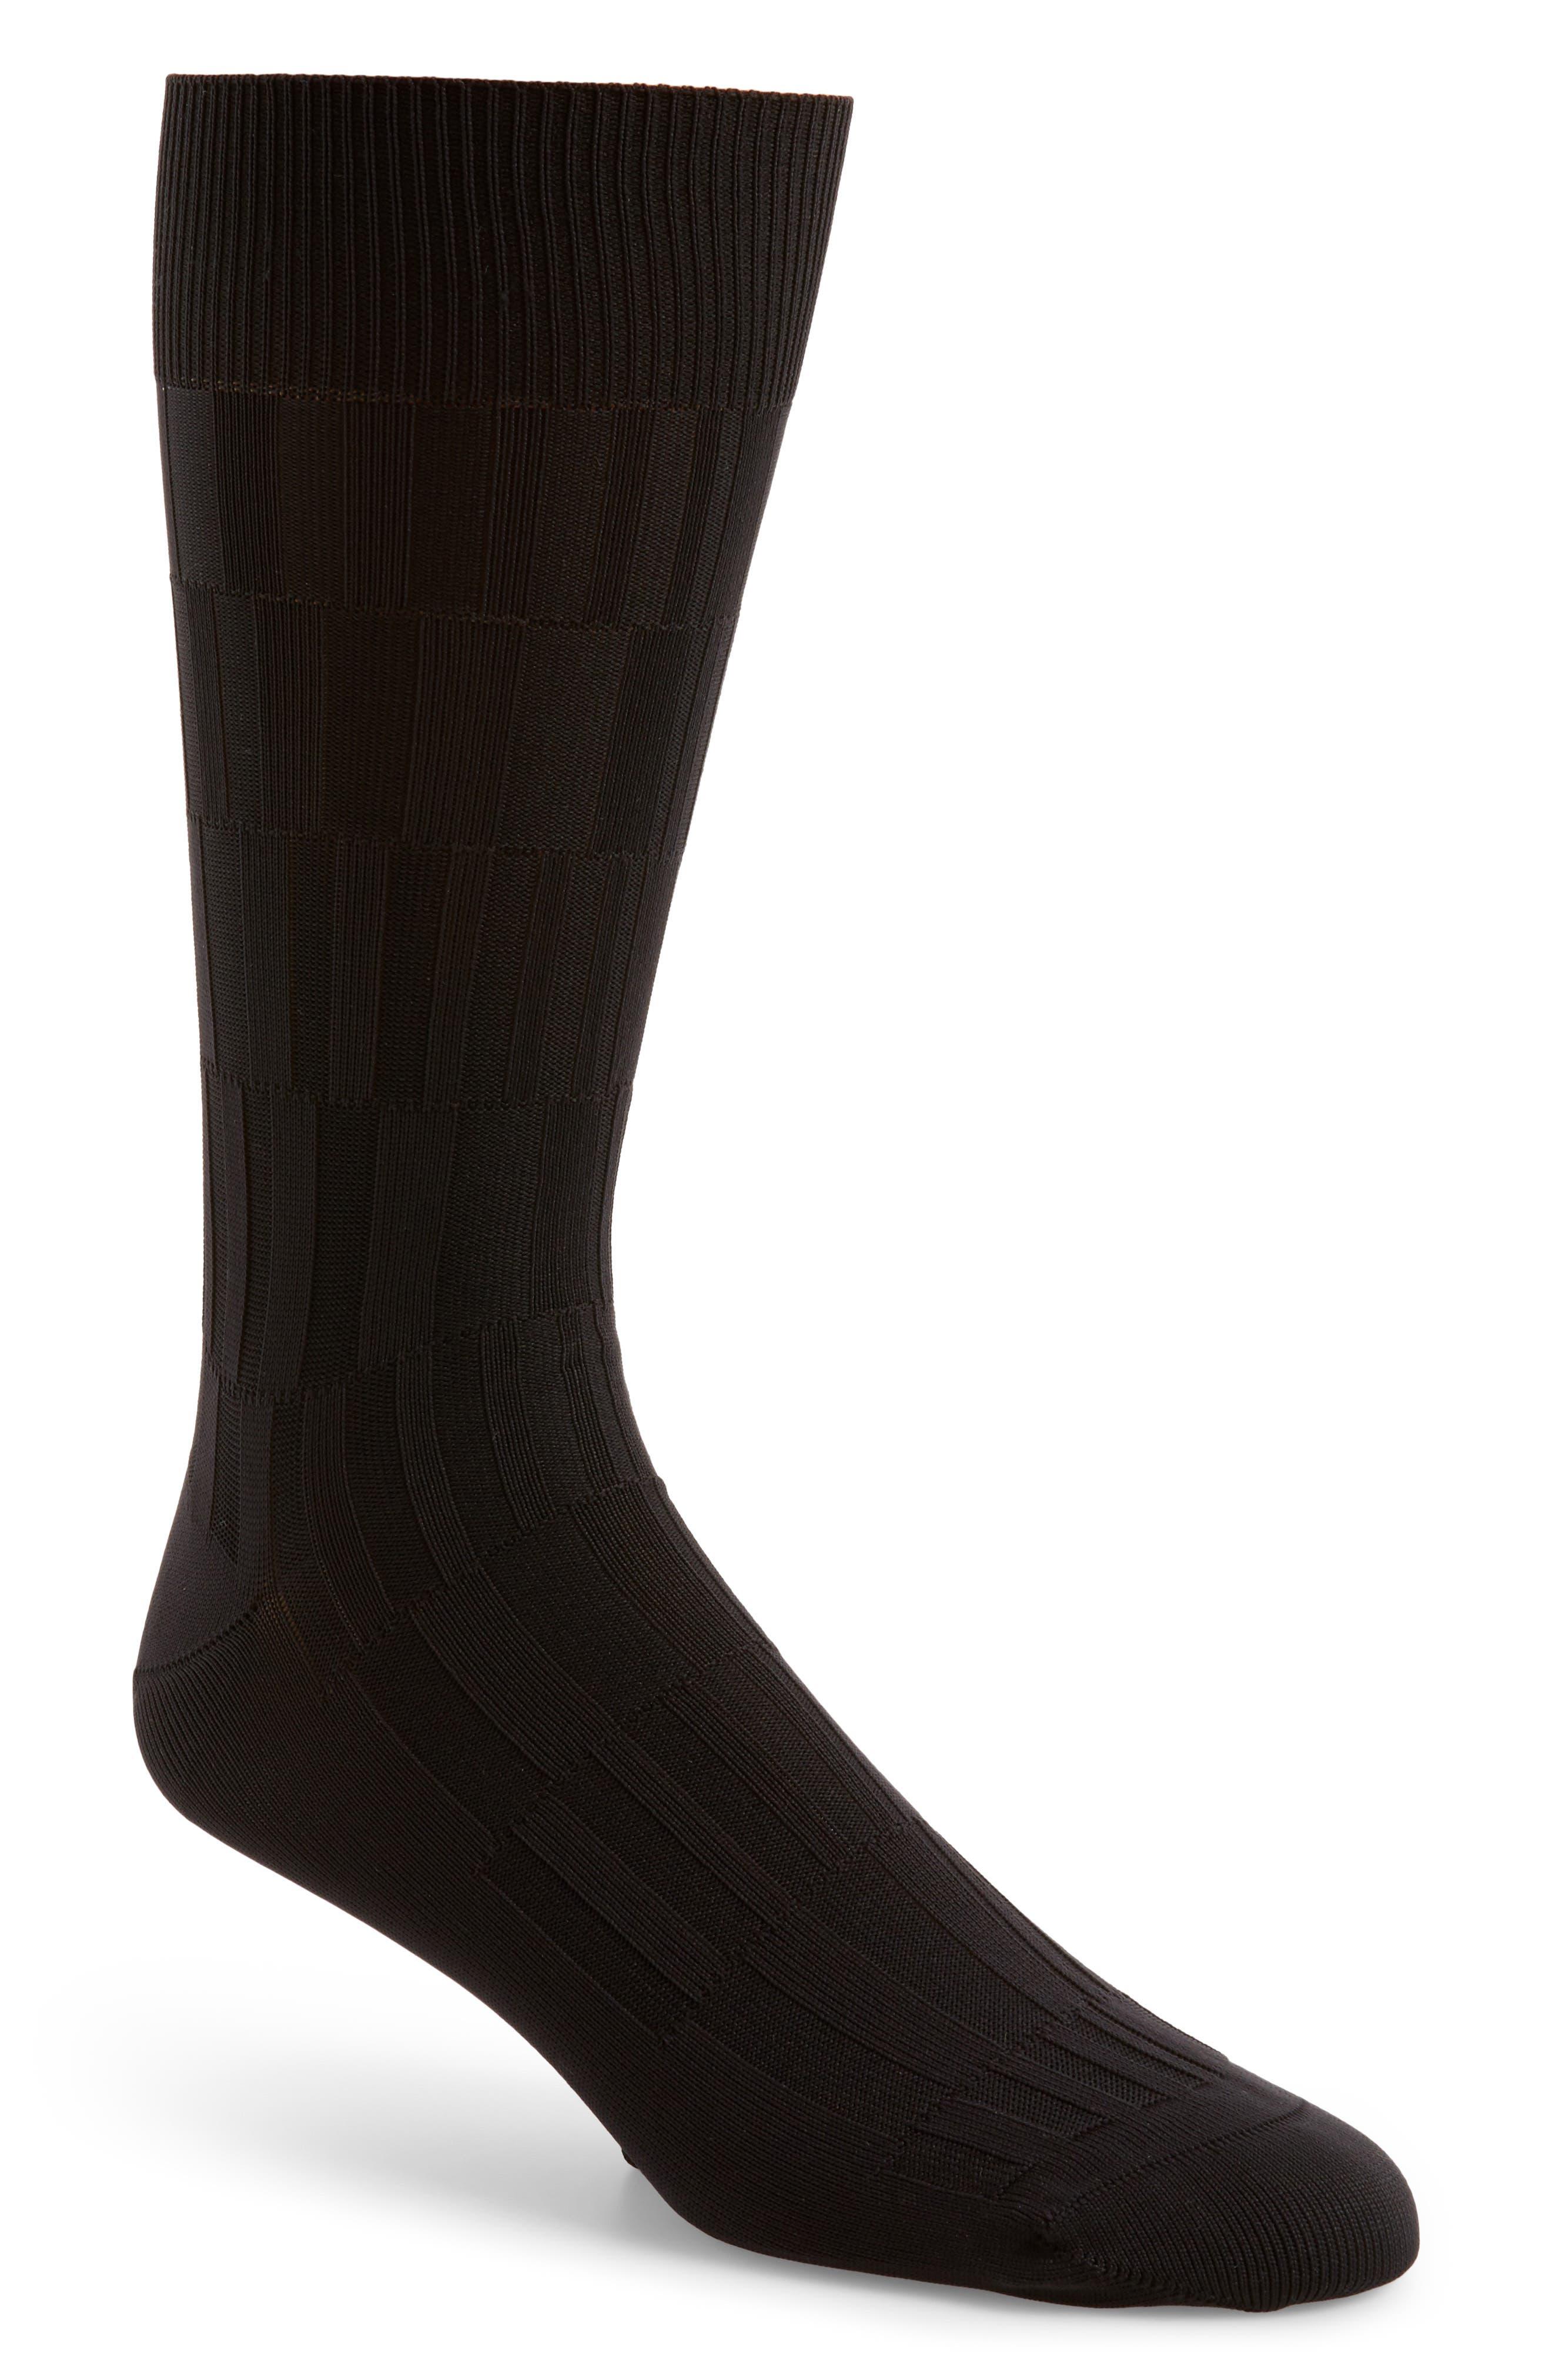 Bar Texture Socks,                         Main,                         color, 001